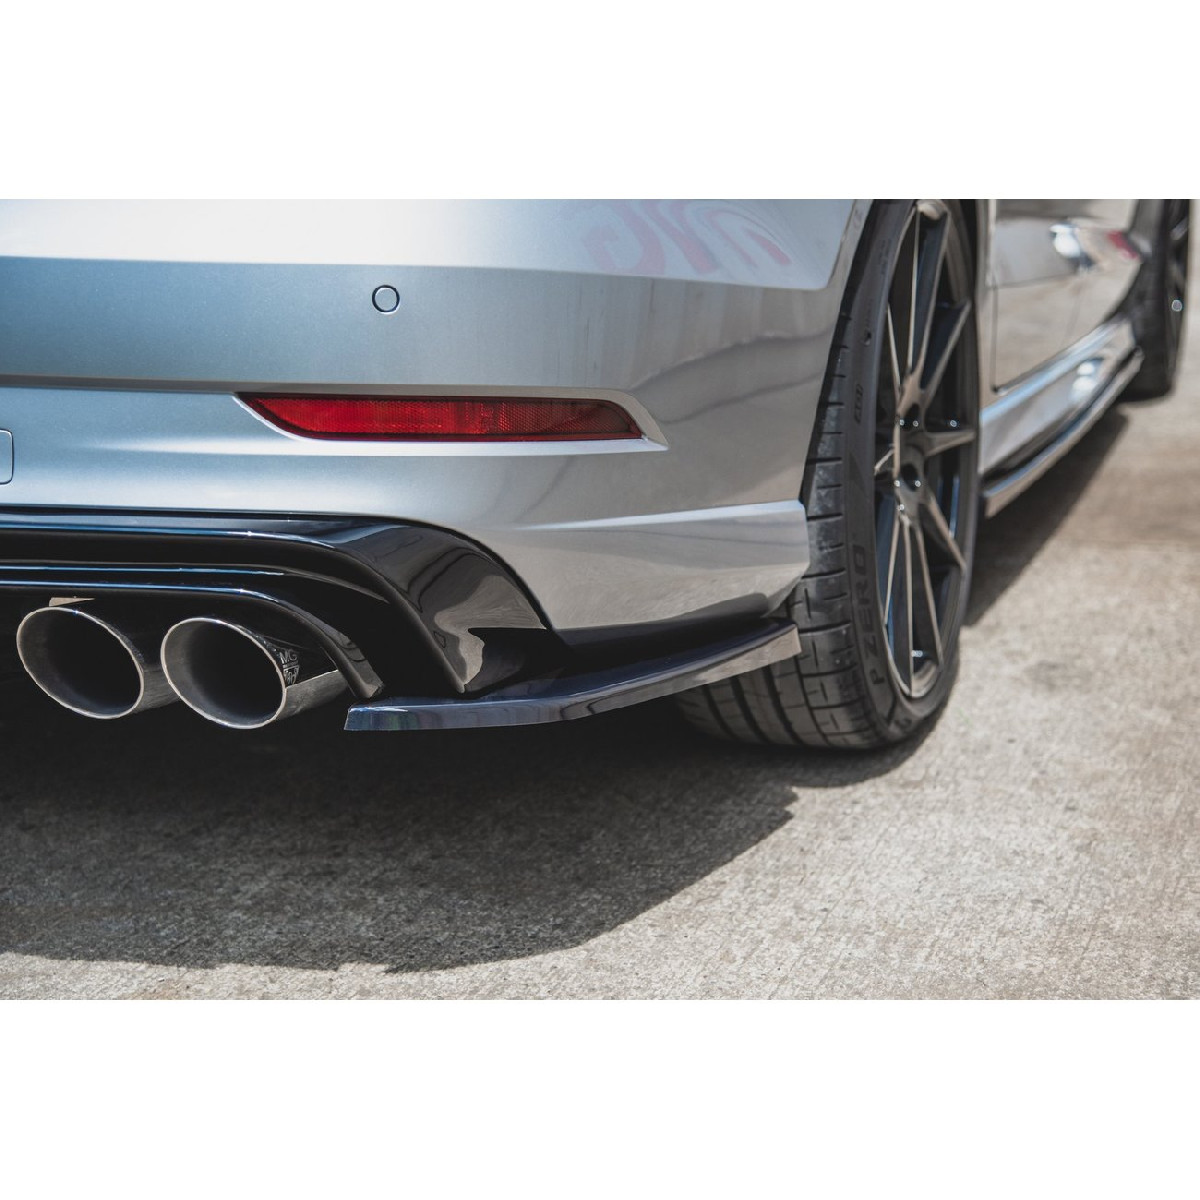 Heck Ansatz Flaps Diffusor V.2 für Audi S3 Limousine 8V Facelift schwarz matt